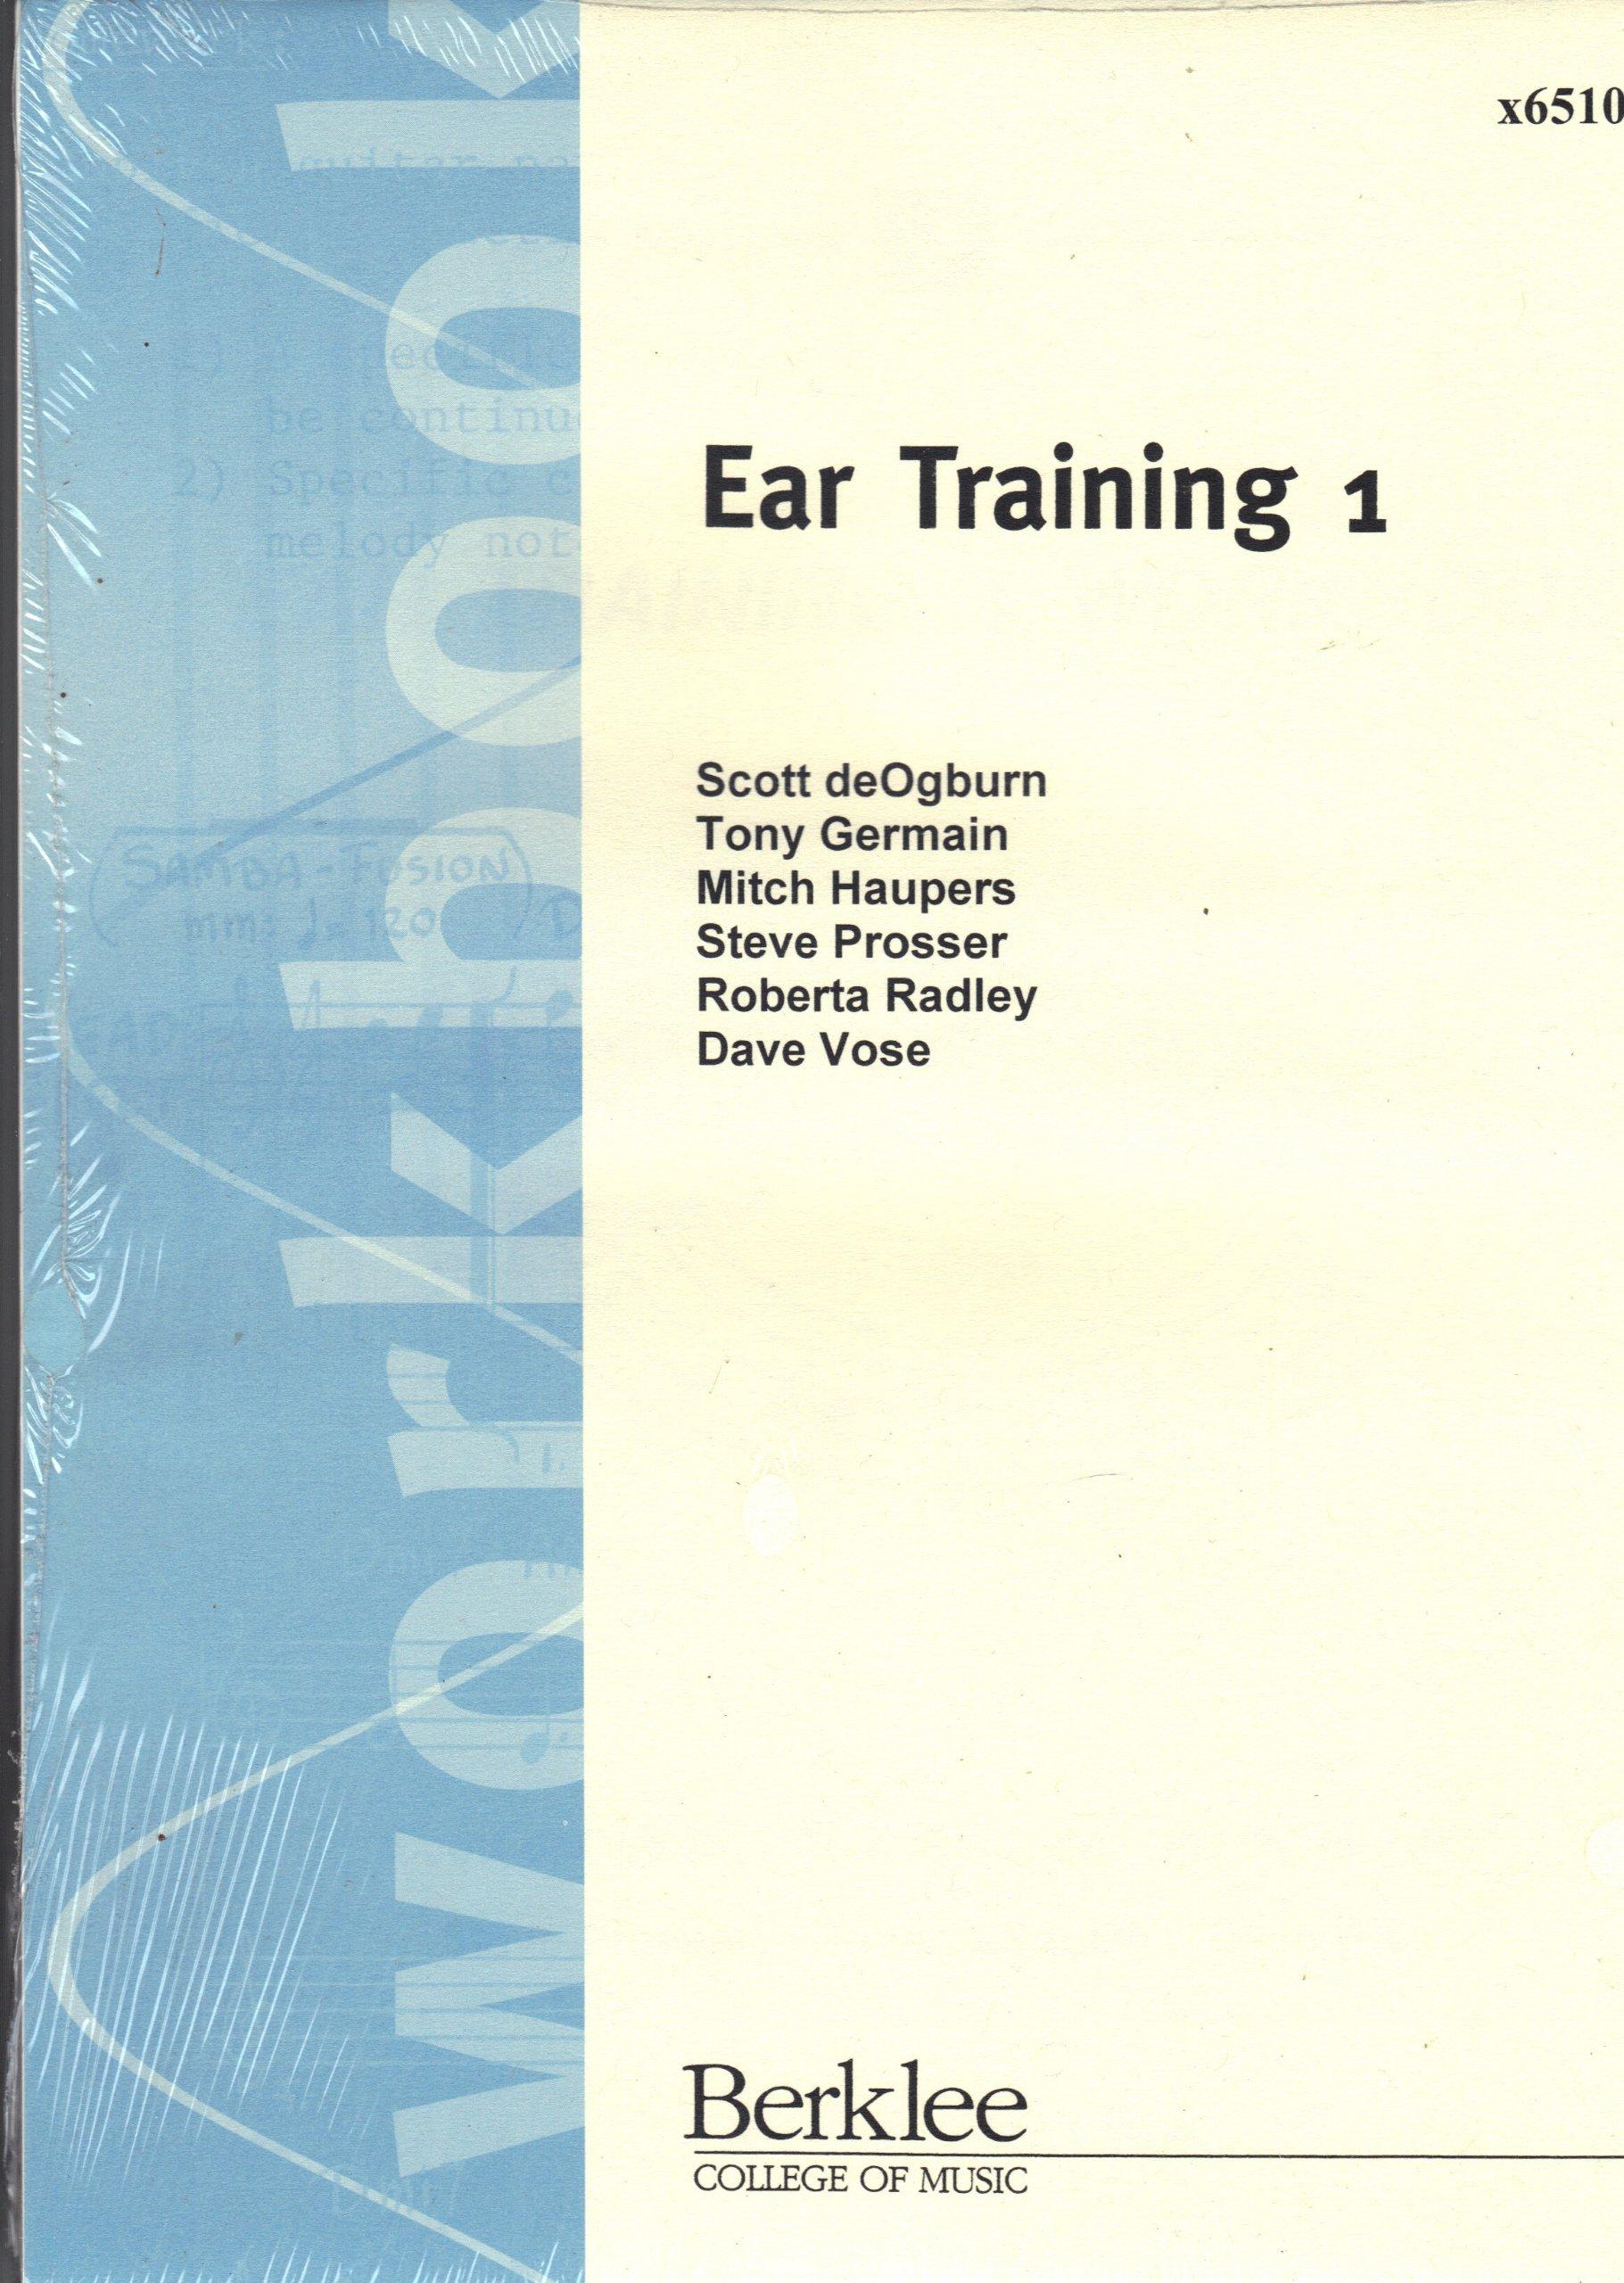 ear training 1 2 3 4 berklee college of music